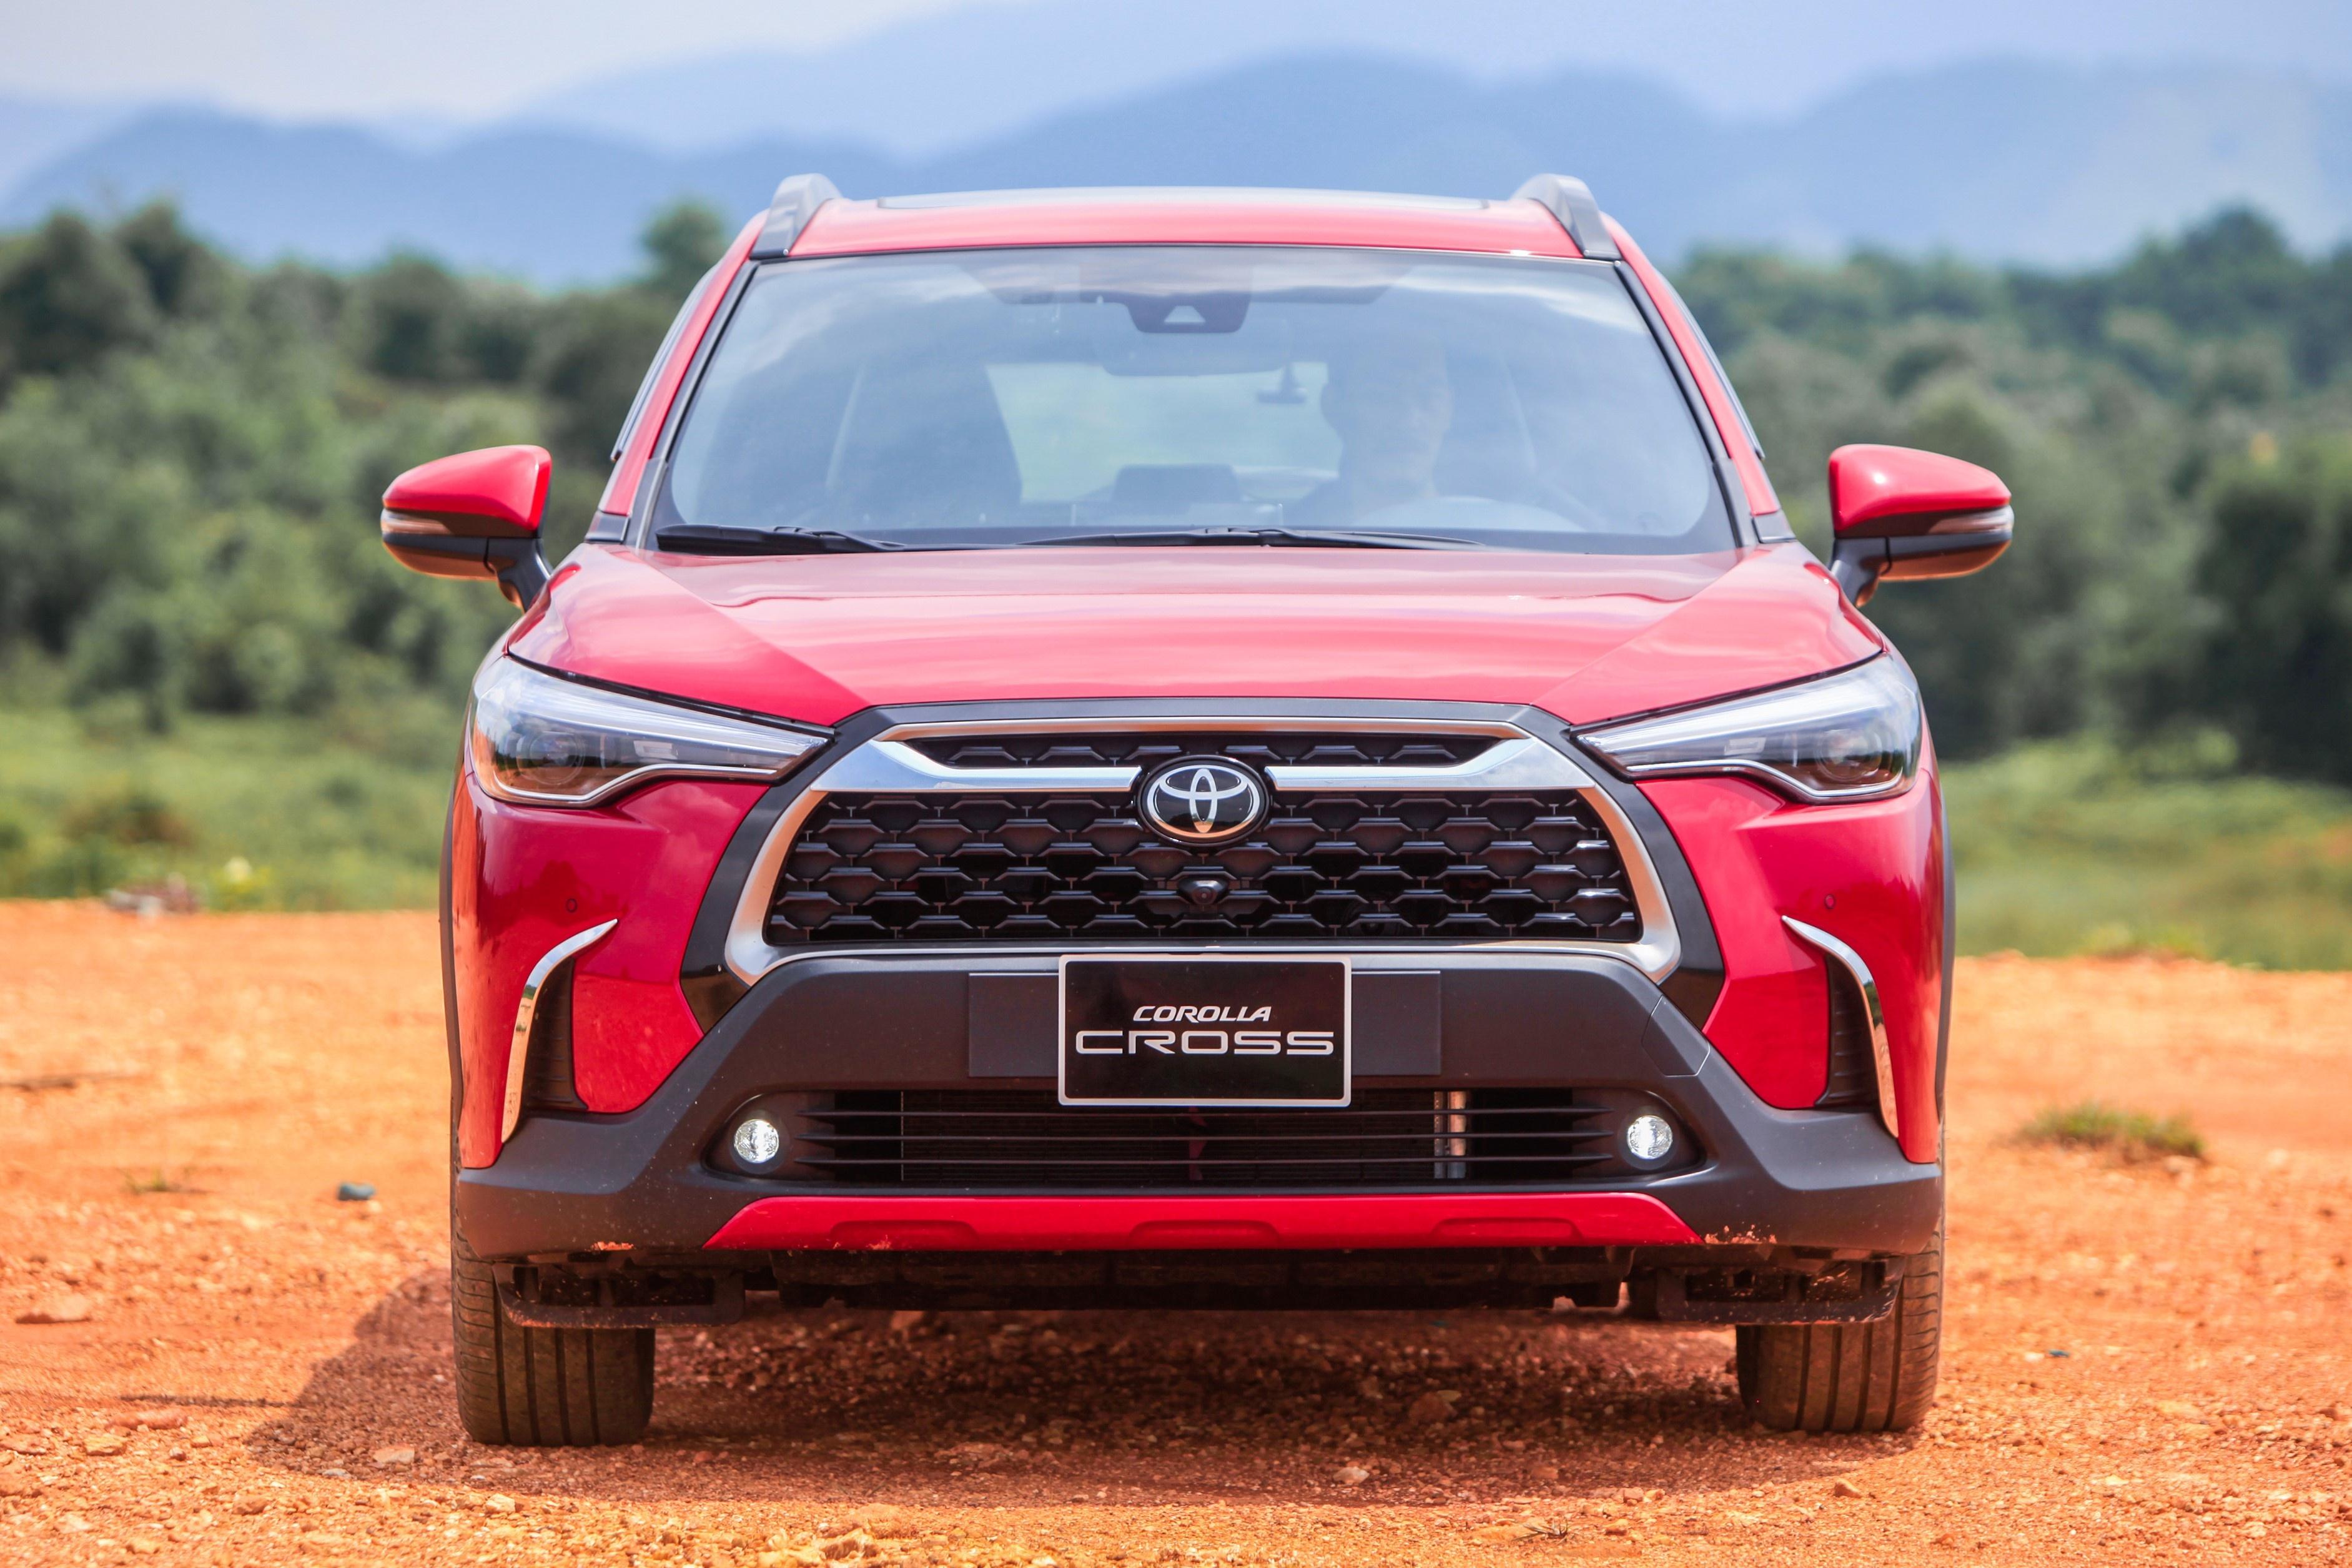 Chon Kia Seltos 1.4 Premium hay Toyota Corolla Cross 1.8V? anh 5